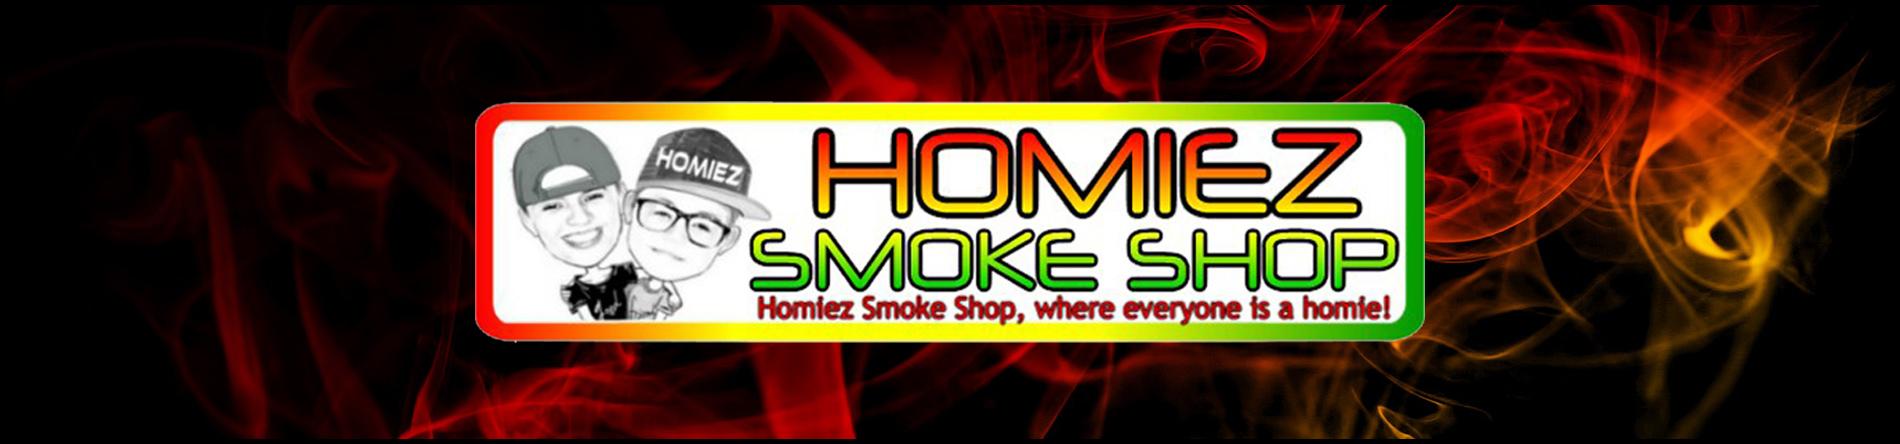 Homiez Smoke Shop is a Smoke Shop in Houston, TX